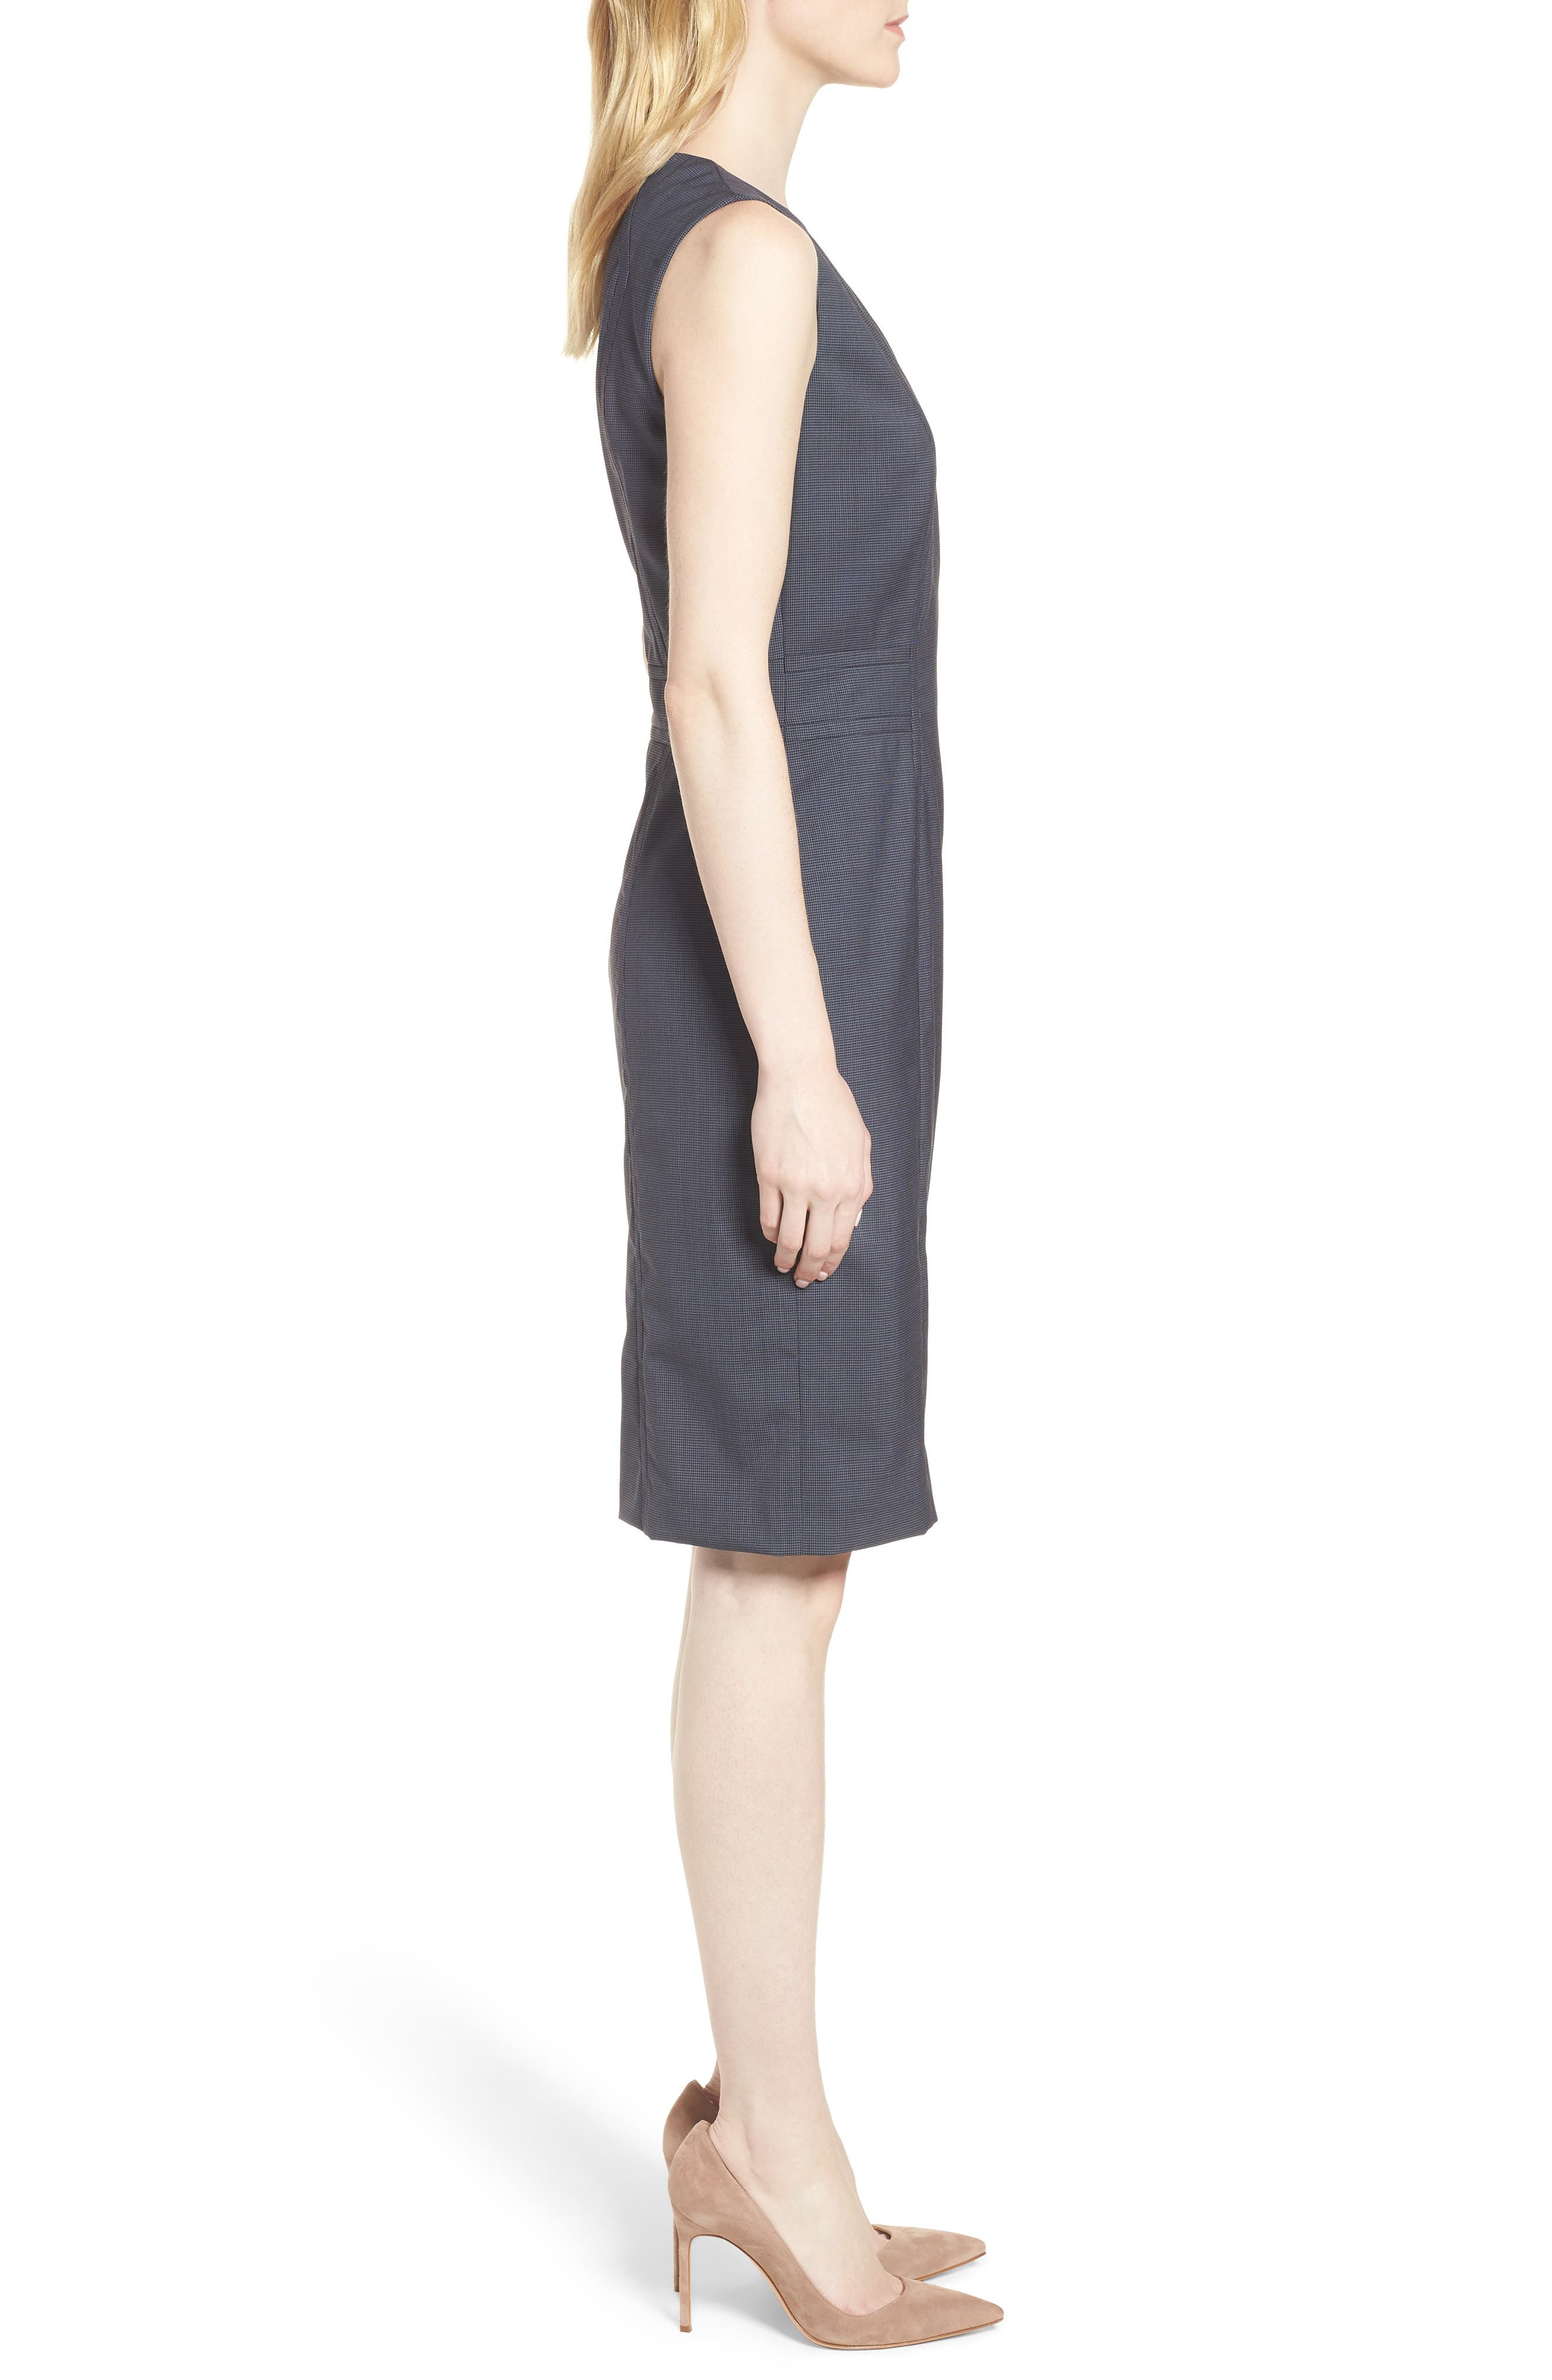 Dalouise Pepita Stretch Wool Sheath Dress,                             Alternate thumbnail 3, color,                             Nautic Blue Fantasy